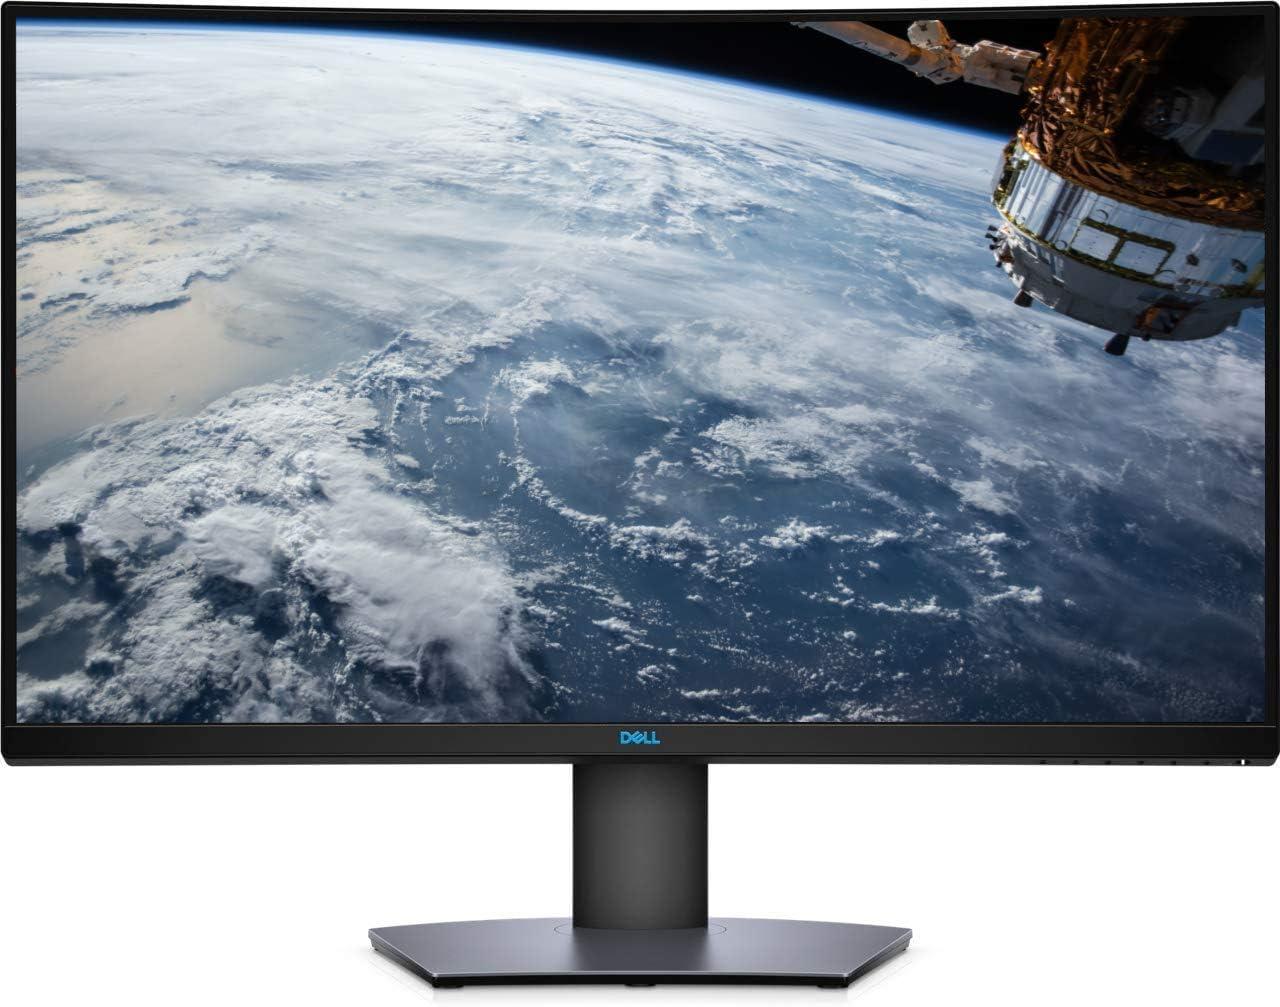 Dell 32-inch QHD 1440p (2560 x 1440) Curved HDR Gaming Monitor, AMD Radeon FreeSync, HDMI & DisplayPorts, Up to 165Hz DisplayPort, 144Hz HDMI